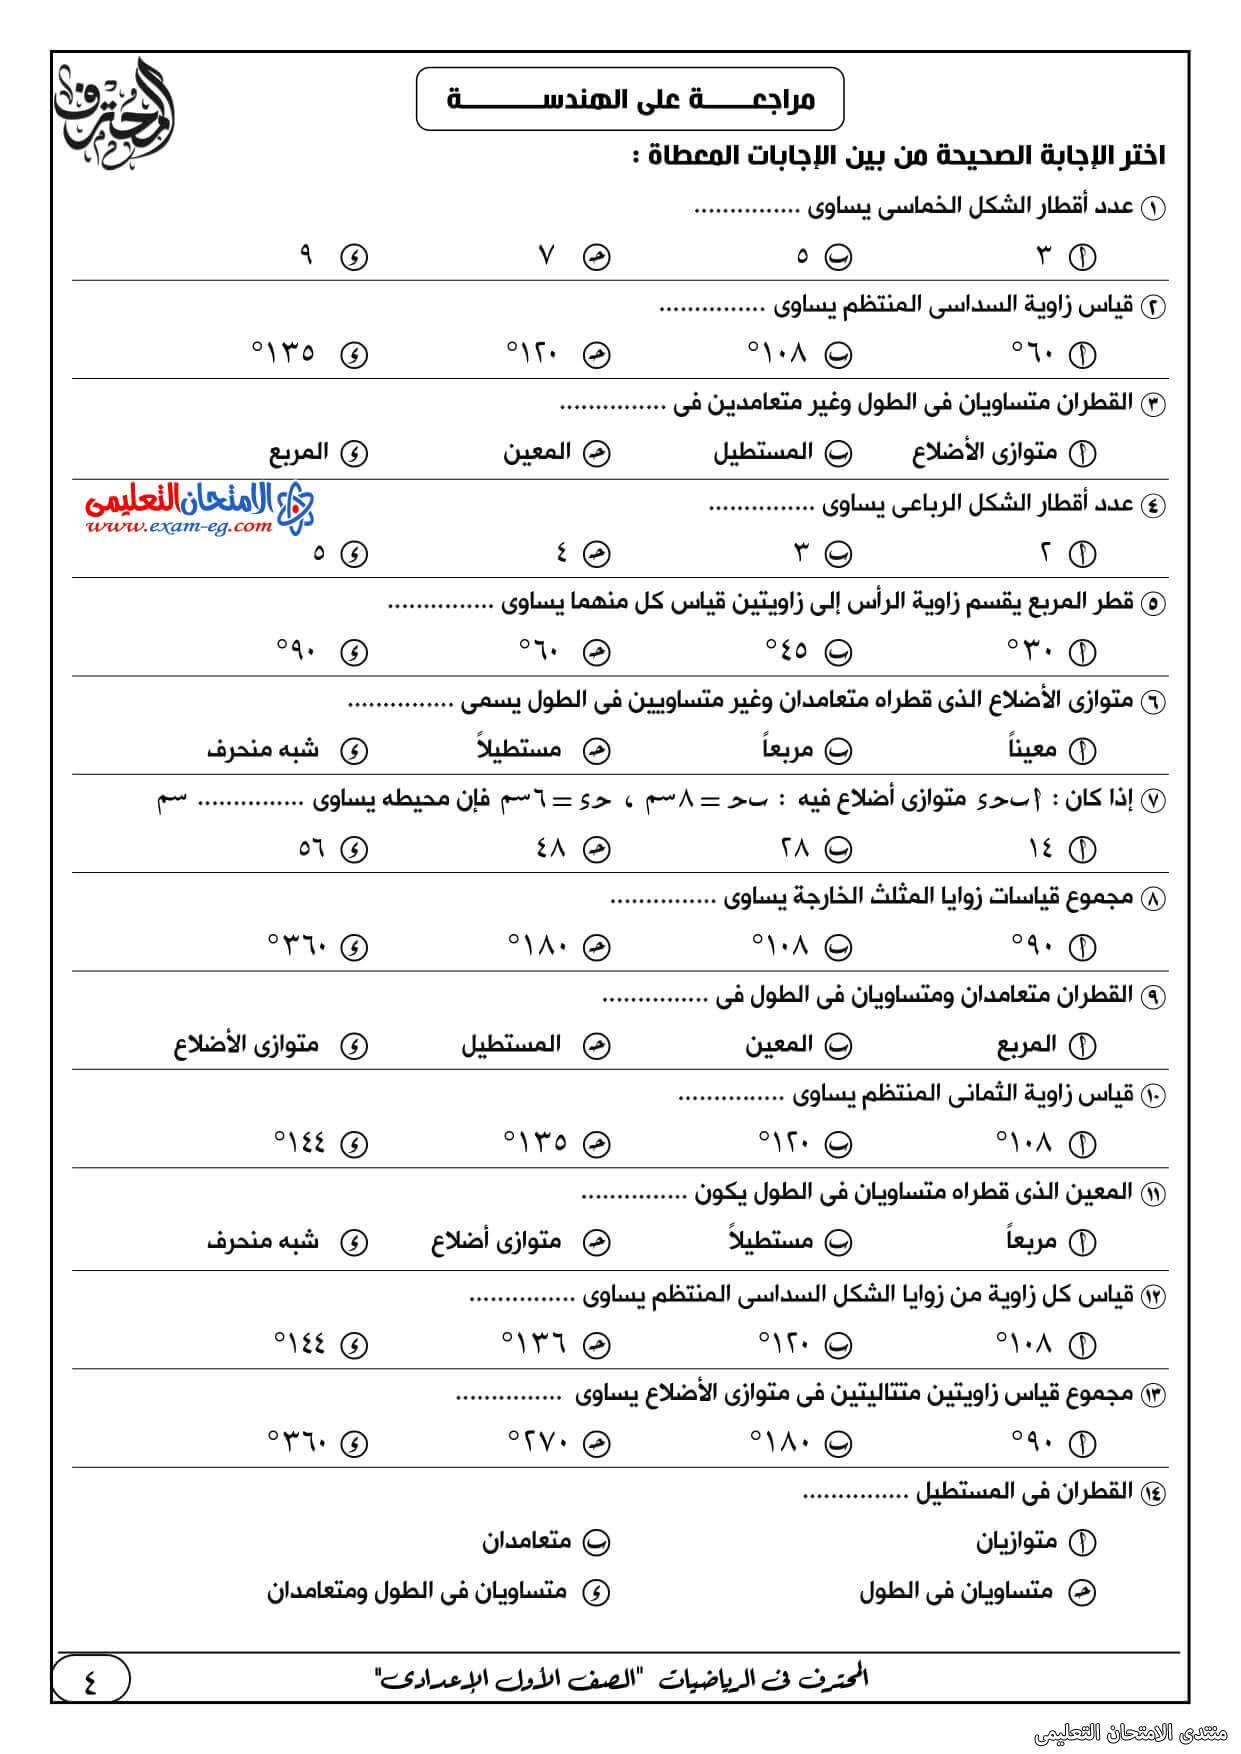 exam-eg.com_161688555023955.jpg